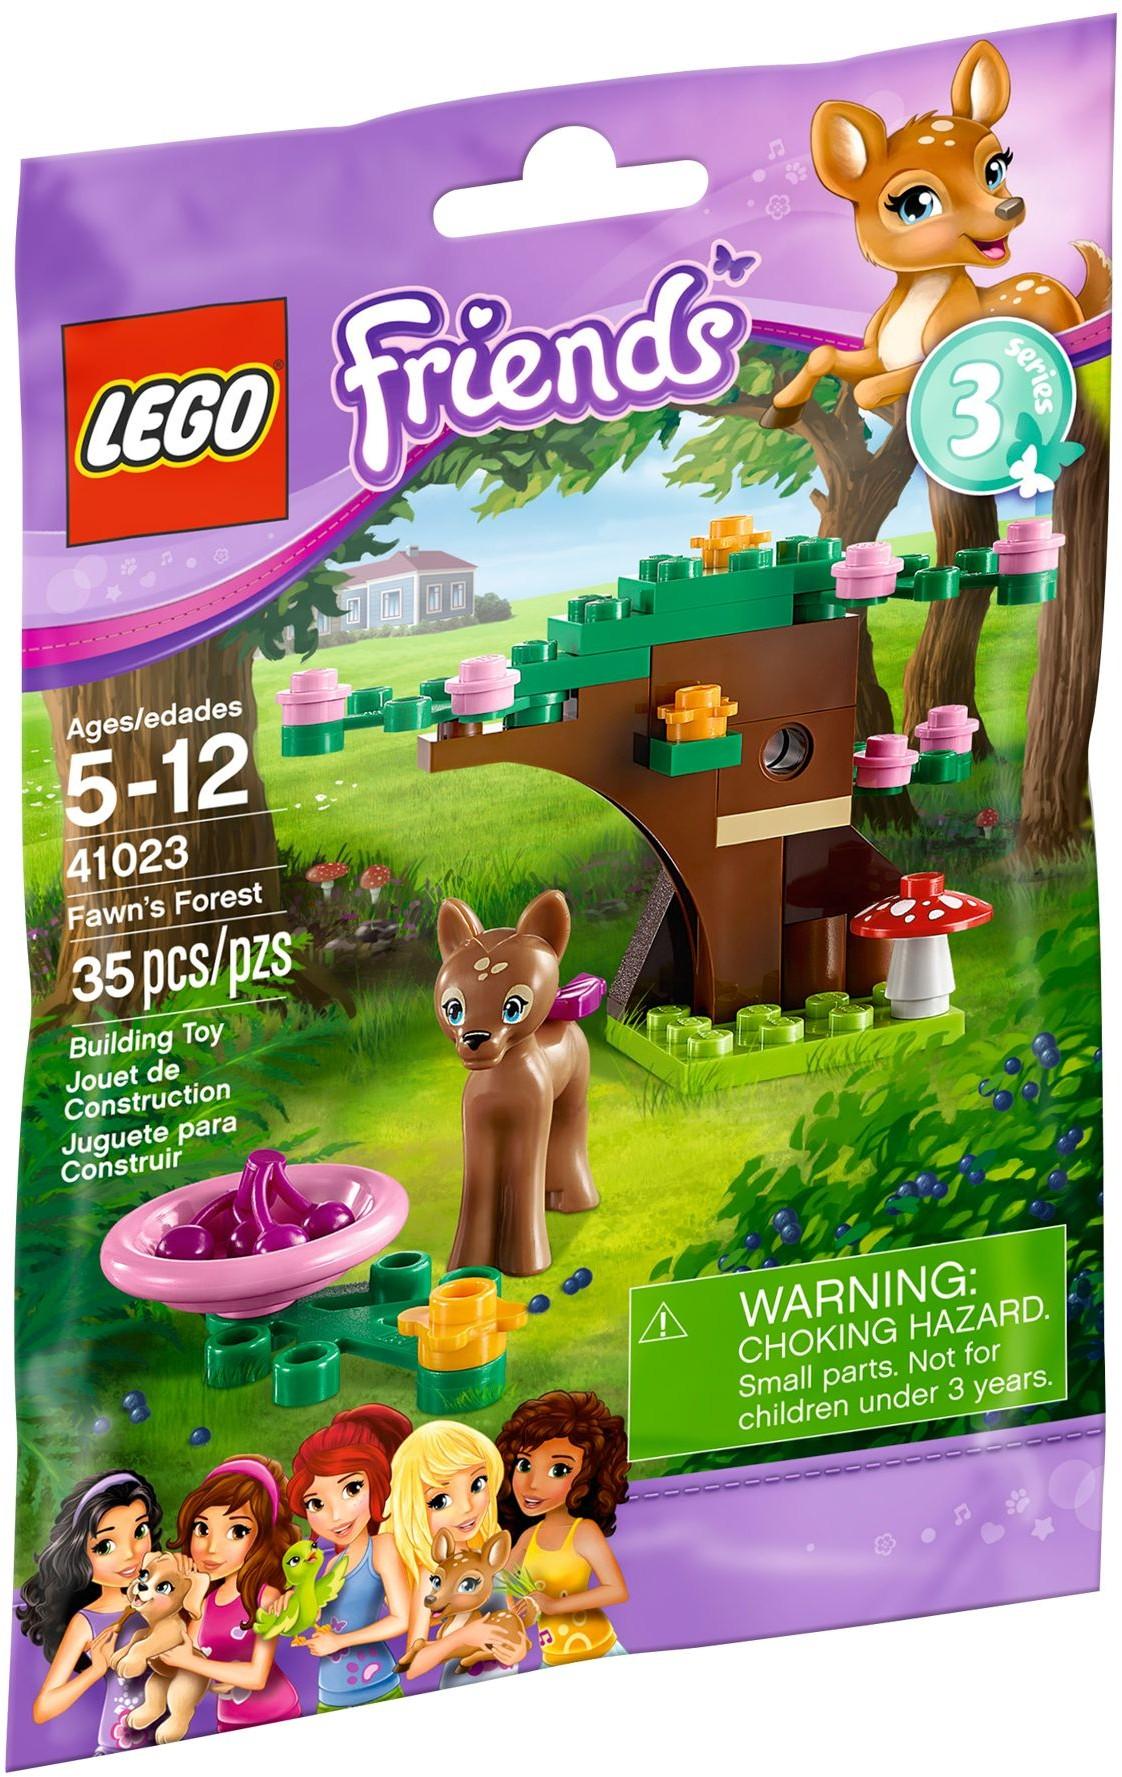 Fawn's Forest (41023)   LEGO Friends Wiki   Fandom